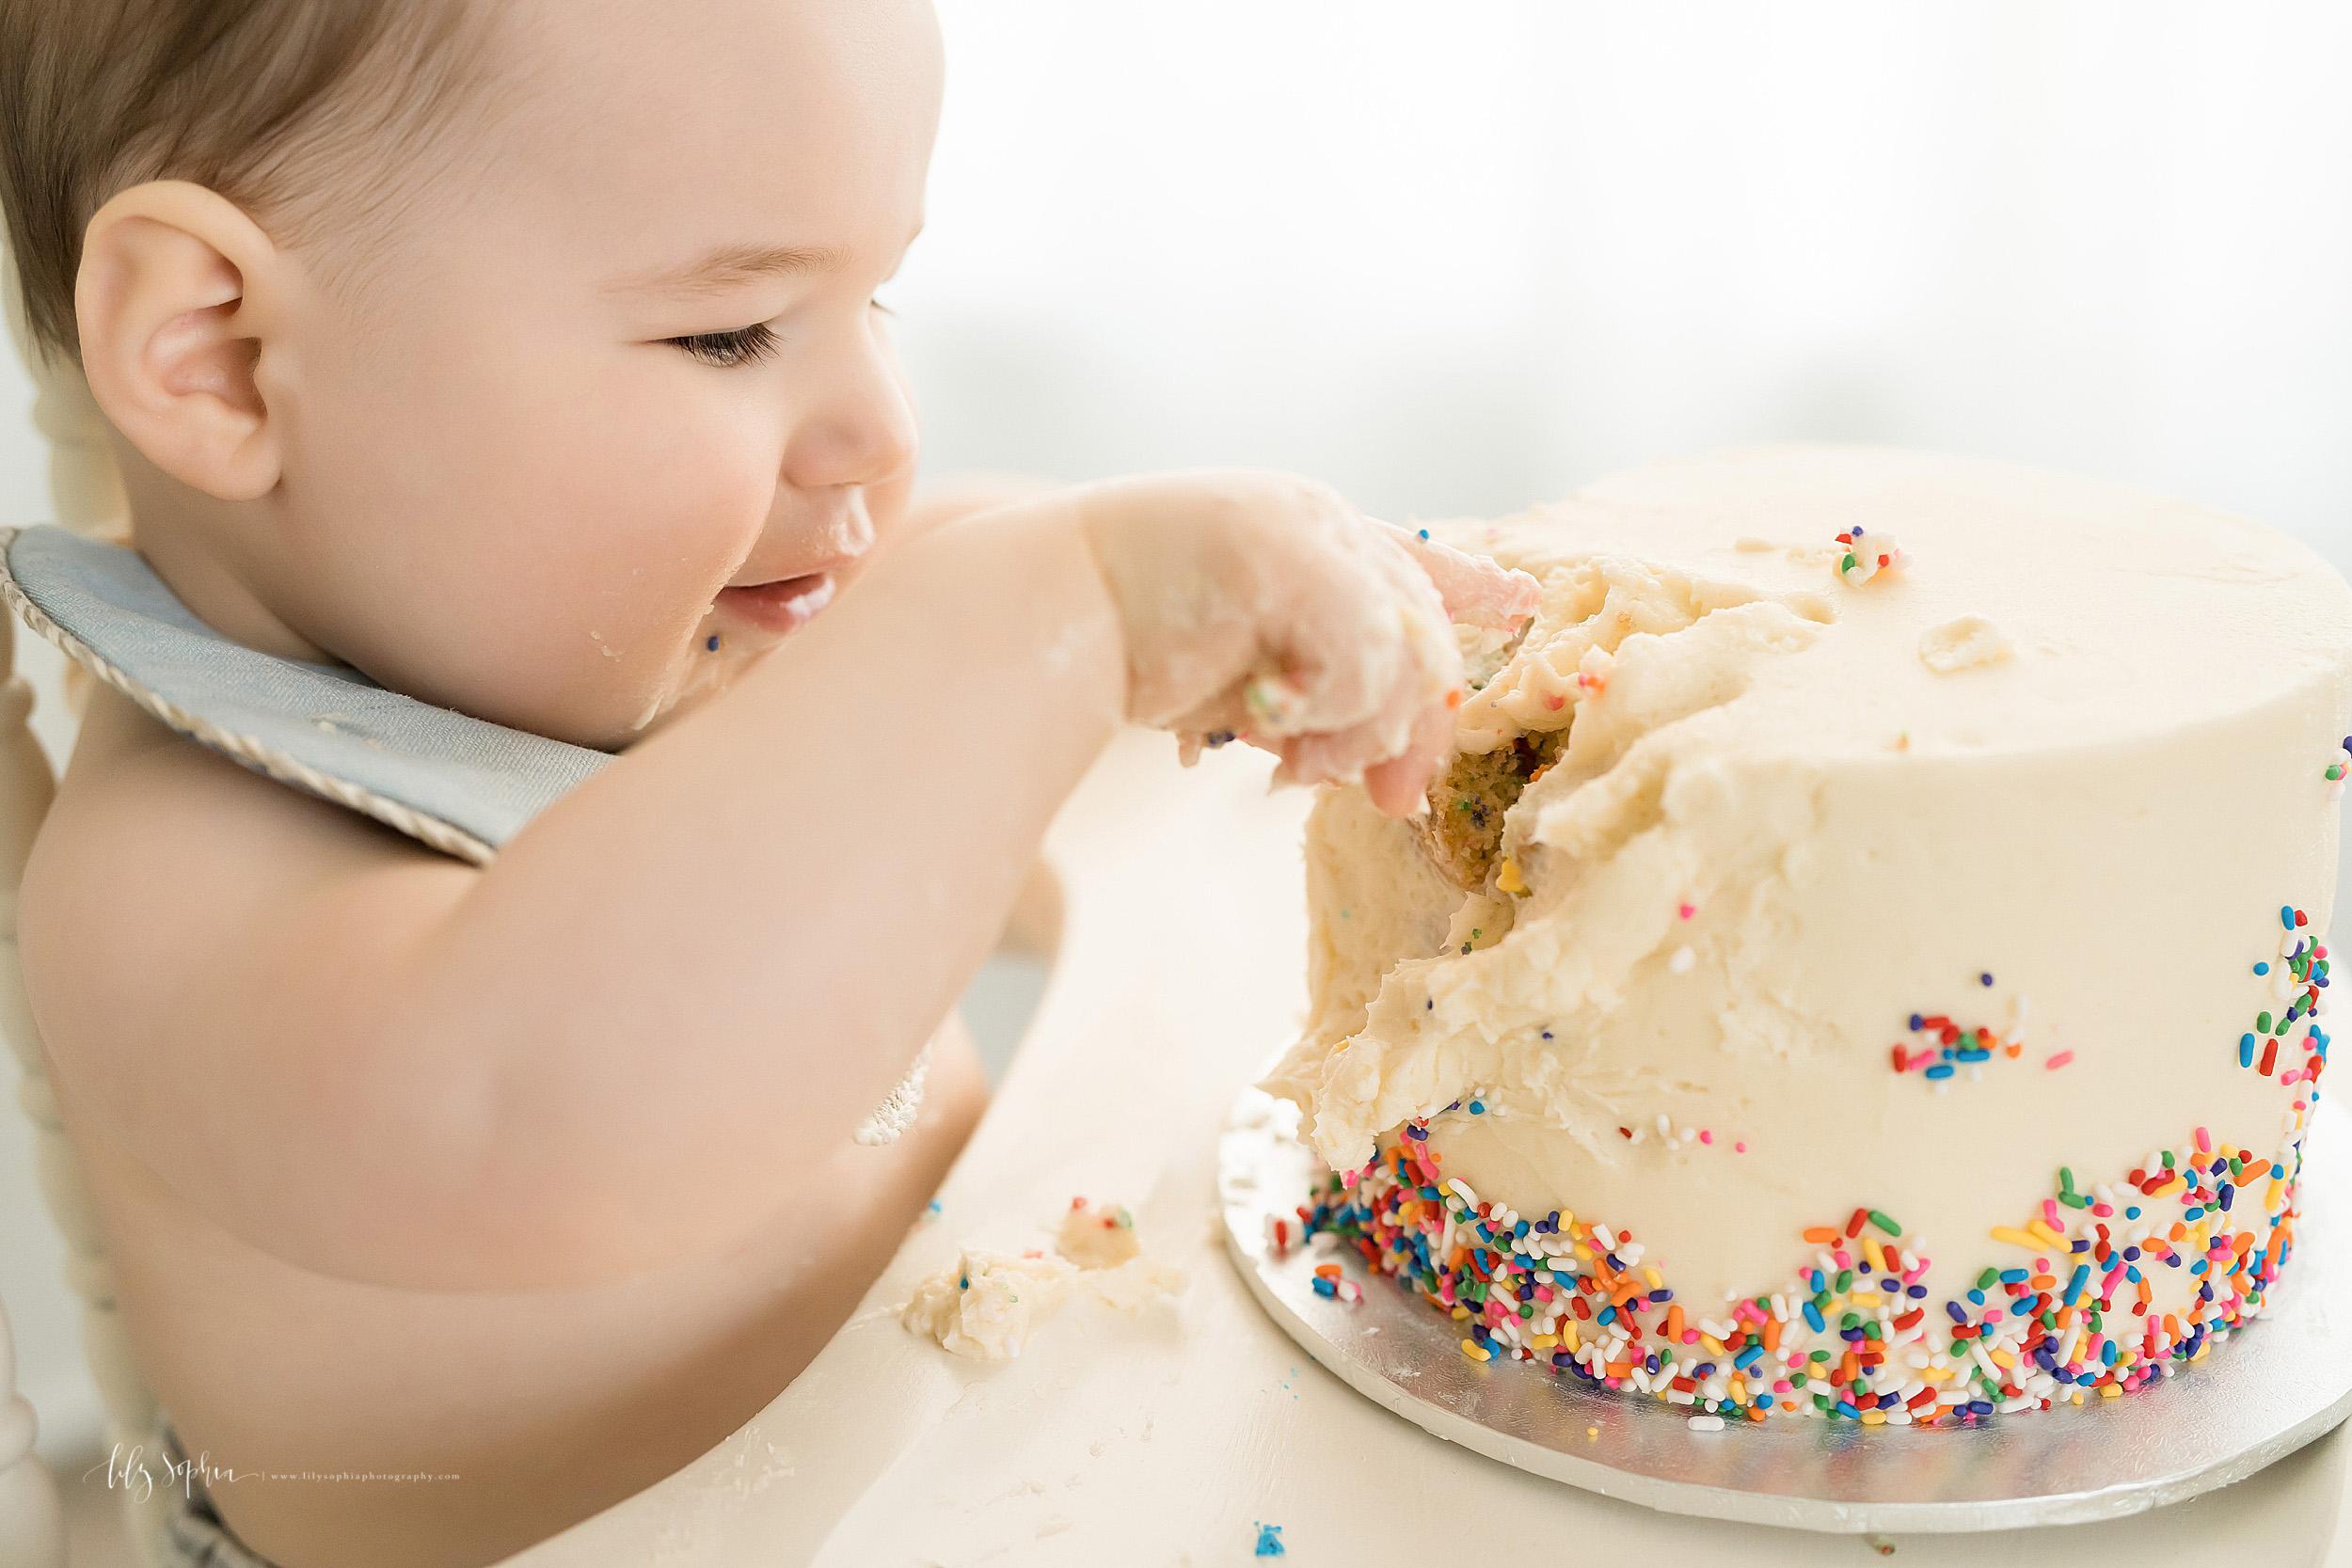 atlanta-decatur-candler-park-sandy-springs-buckhead-virginia-highlands-west-end-decatur-lily-sophia-photography-one-year-old-baby-boy-milestone-studio-family-photos-first-birthday-sprinkle-cake-smash_2222.jpg